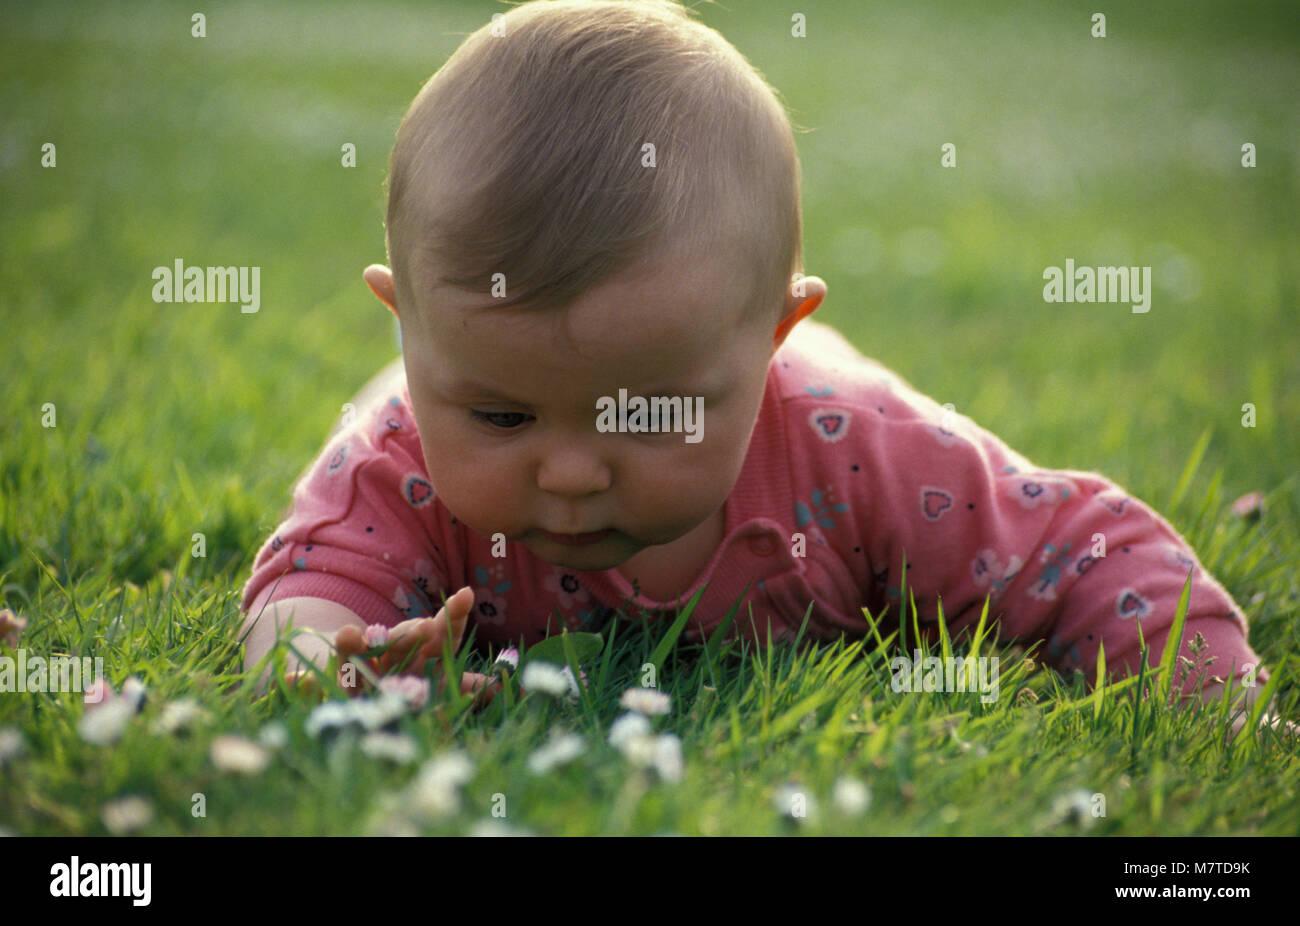 baby girl lying on tummy in garden exploring daisies - Stock Image